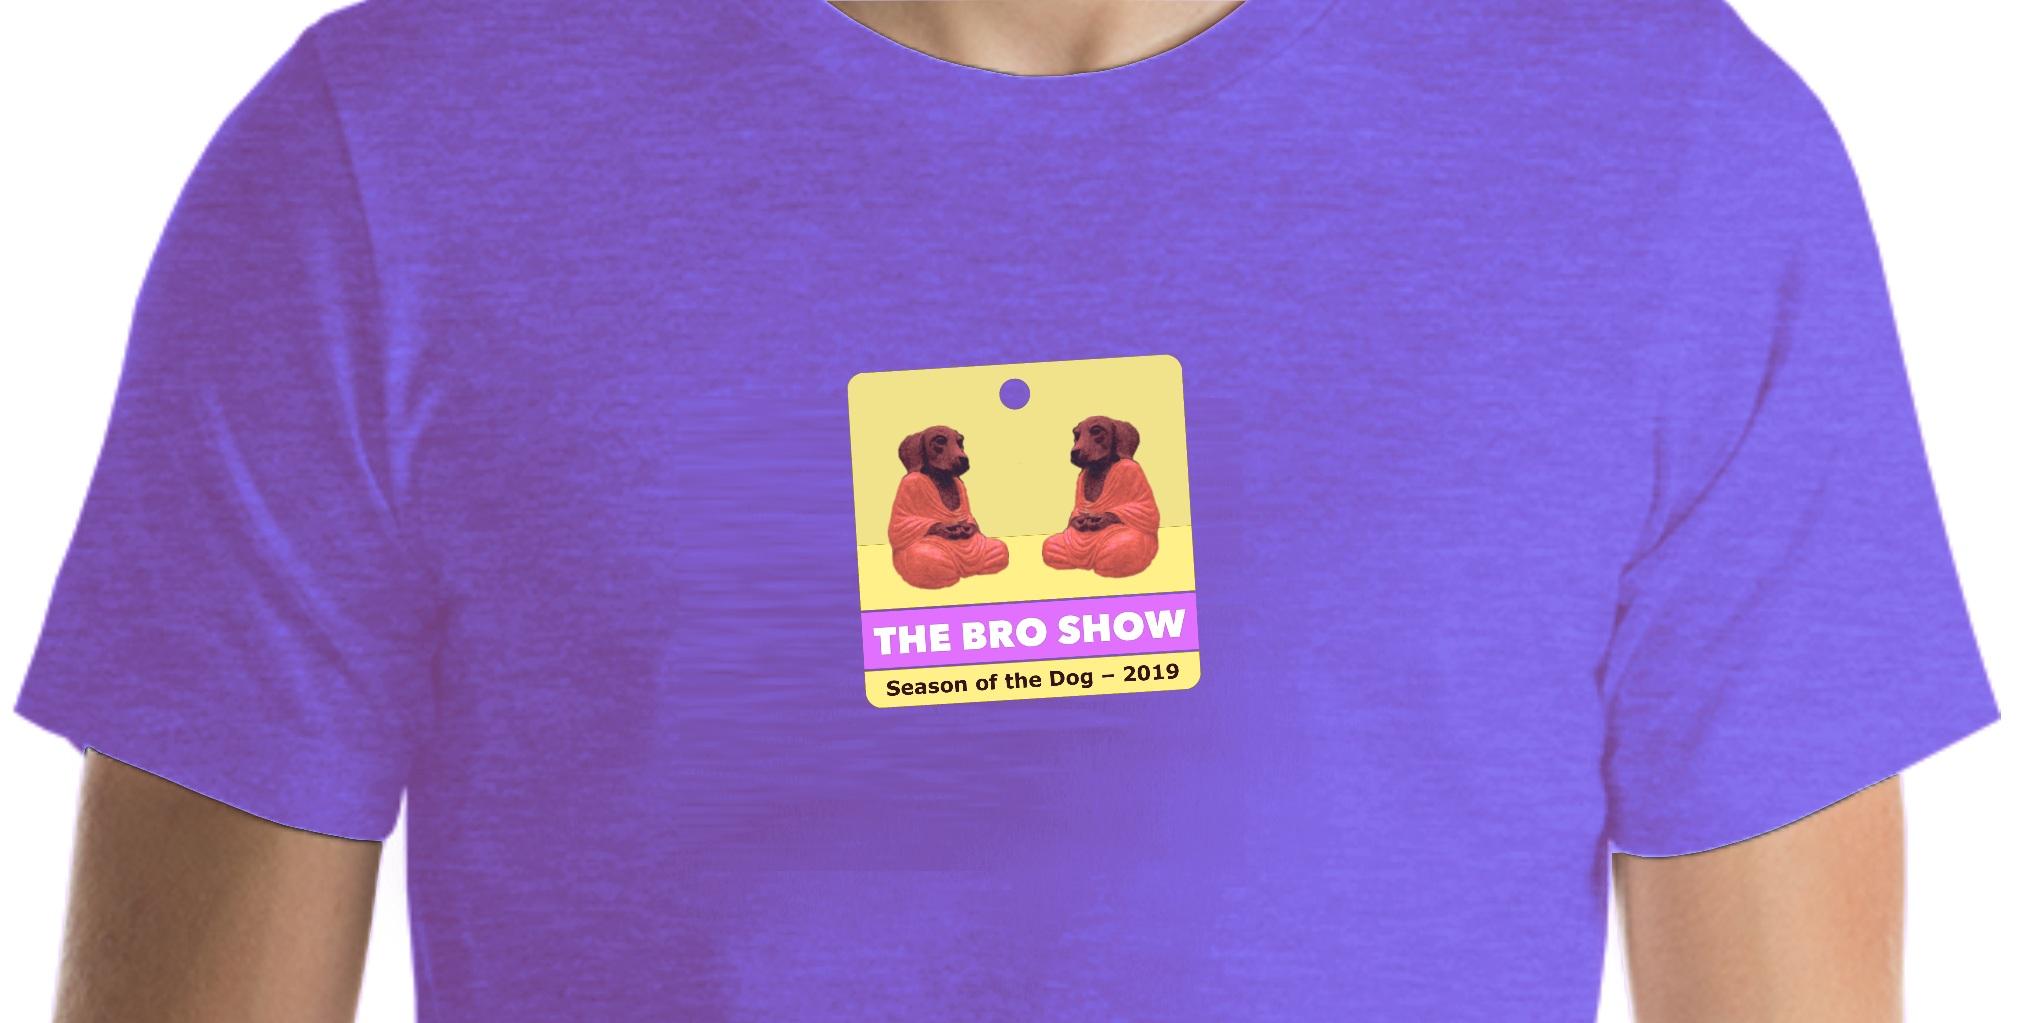 New Season of the Dog T-shirt